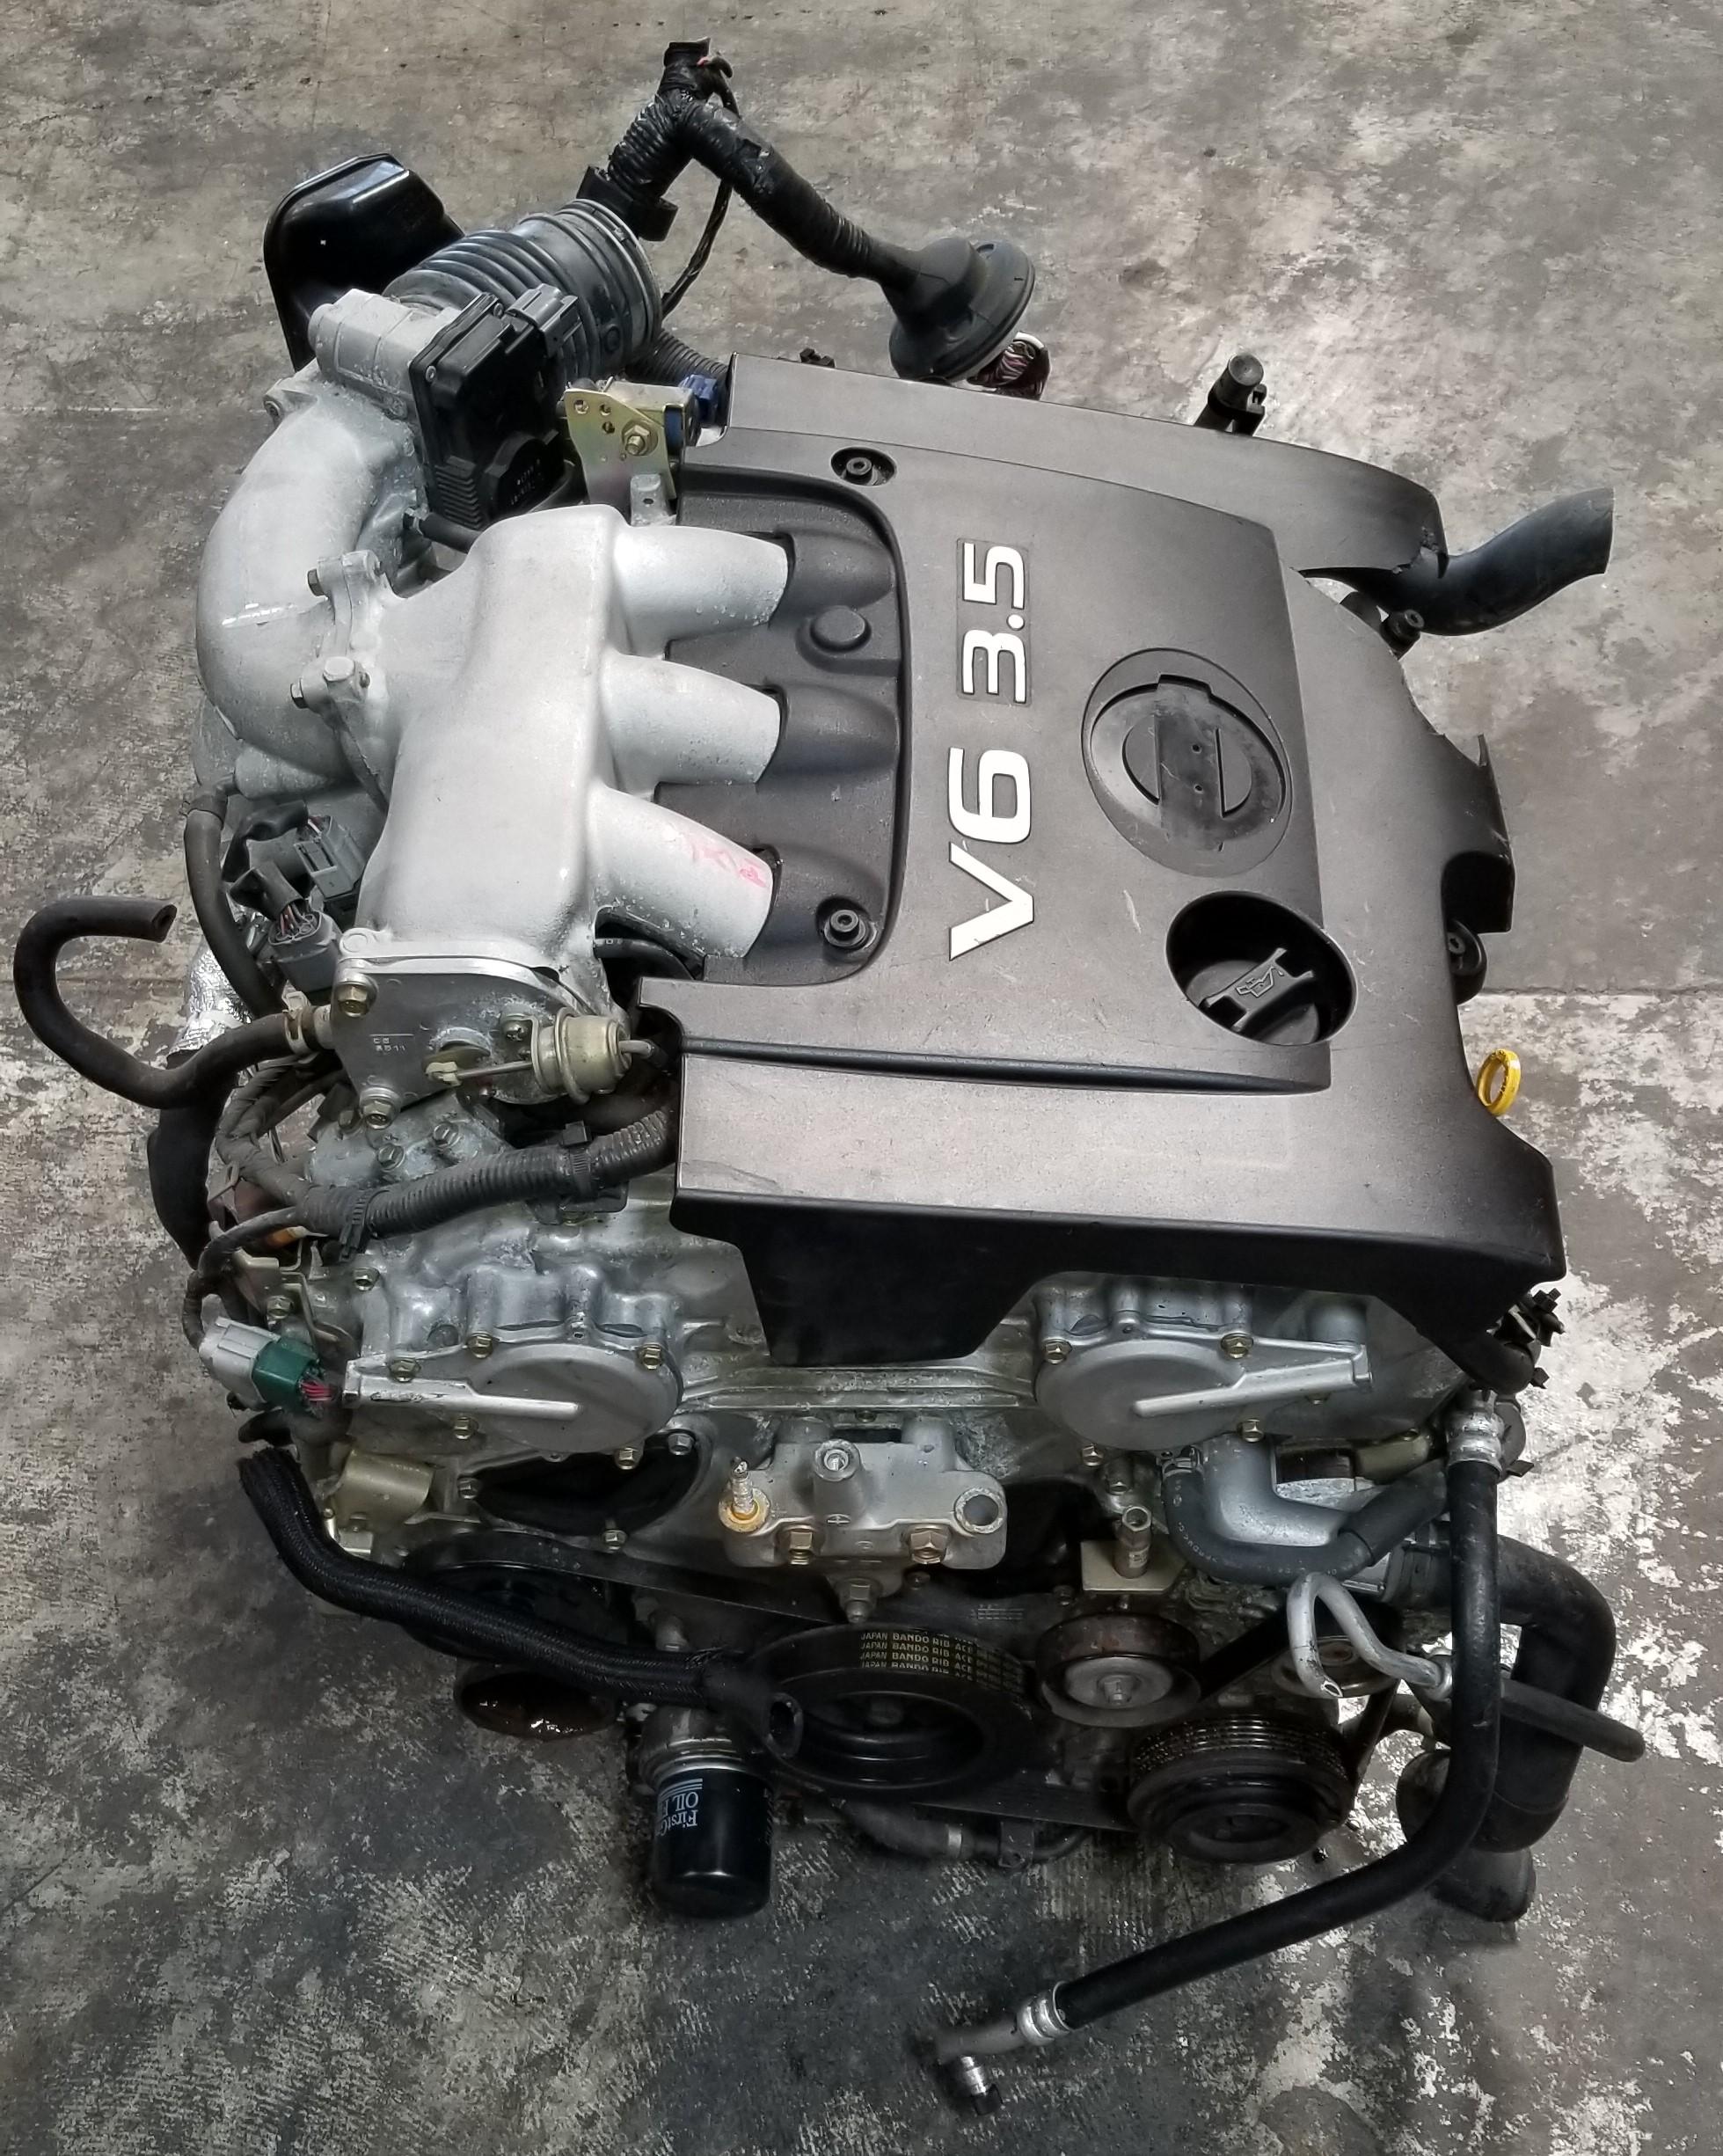 Quest Auto Parts >> VQ35DE JDM 2003-2007 Nissan Altima Maxima Murano Quest 3.5L VQ35 V6 Engine Trans | JDM Of San Diego